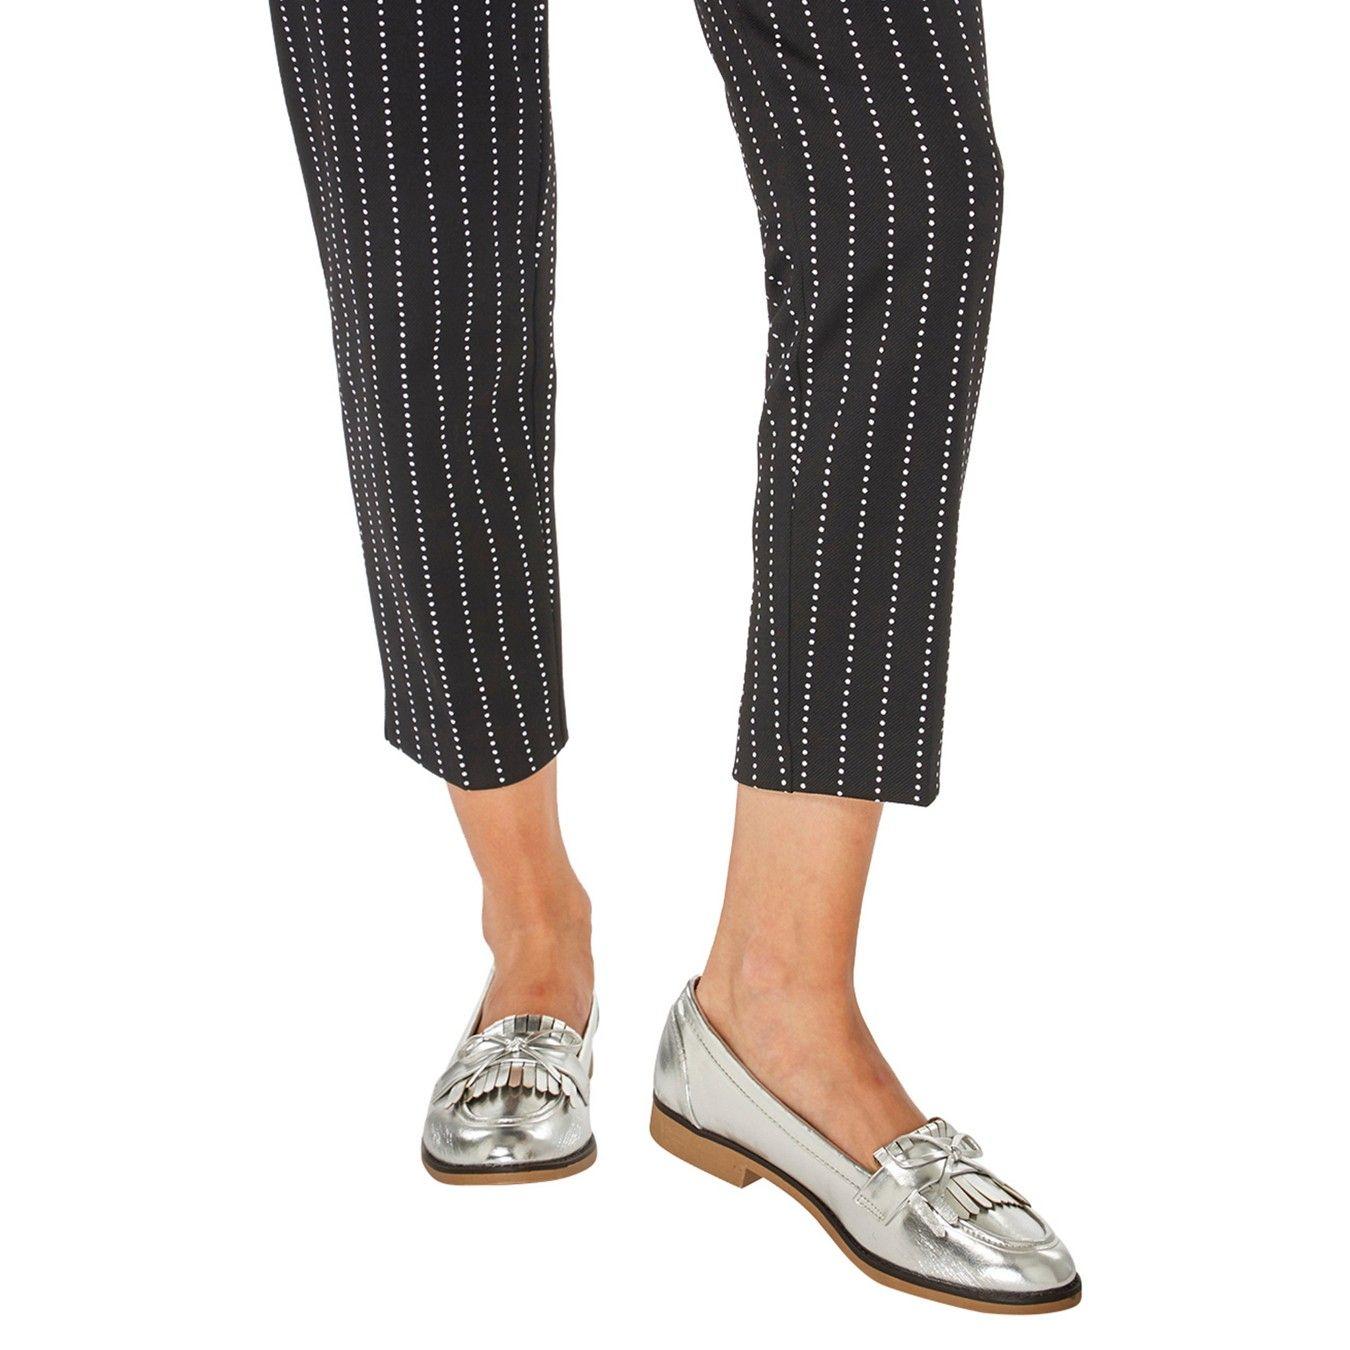 216c7c3efa1 Wide fit silver lotta loafers